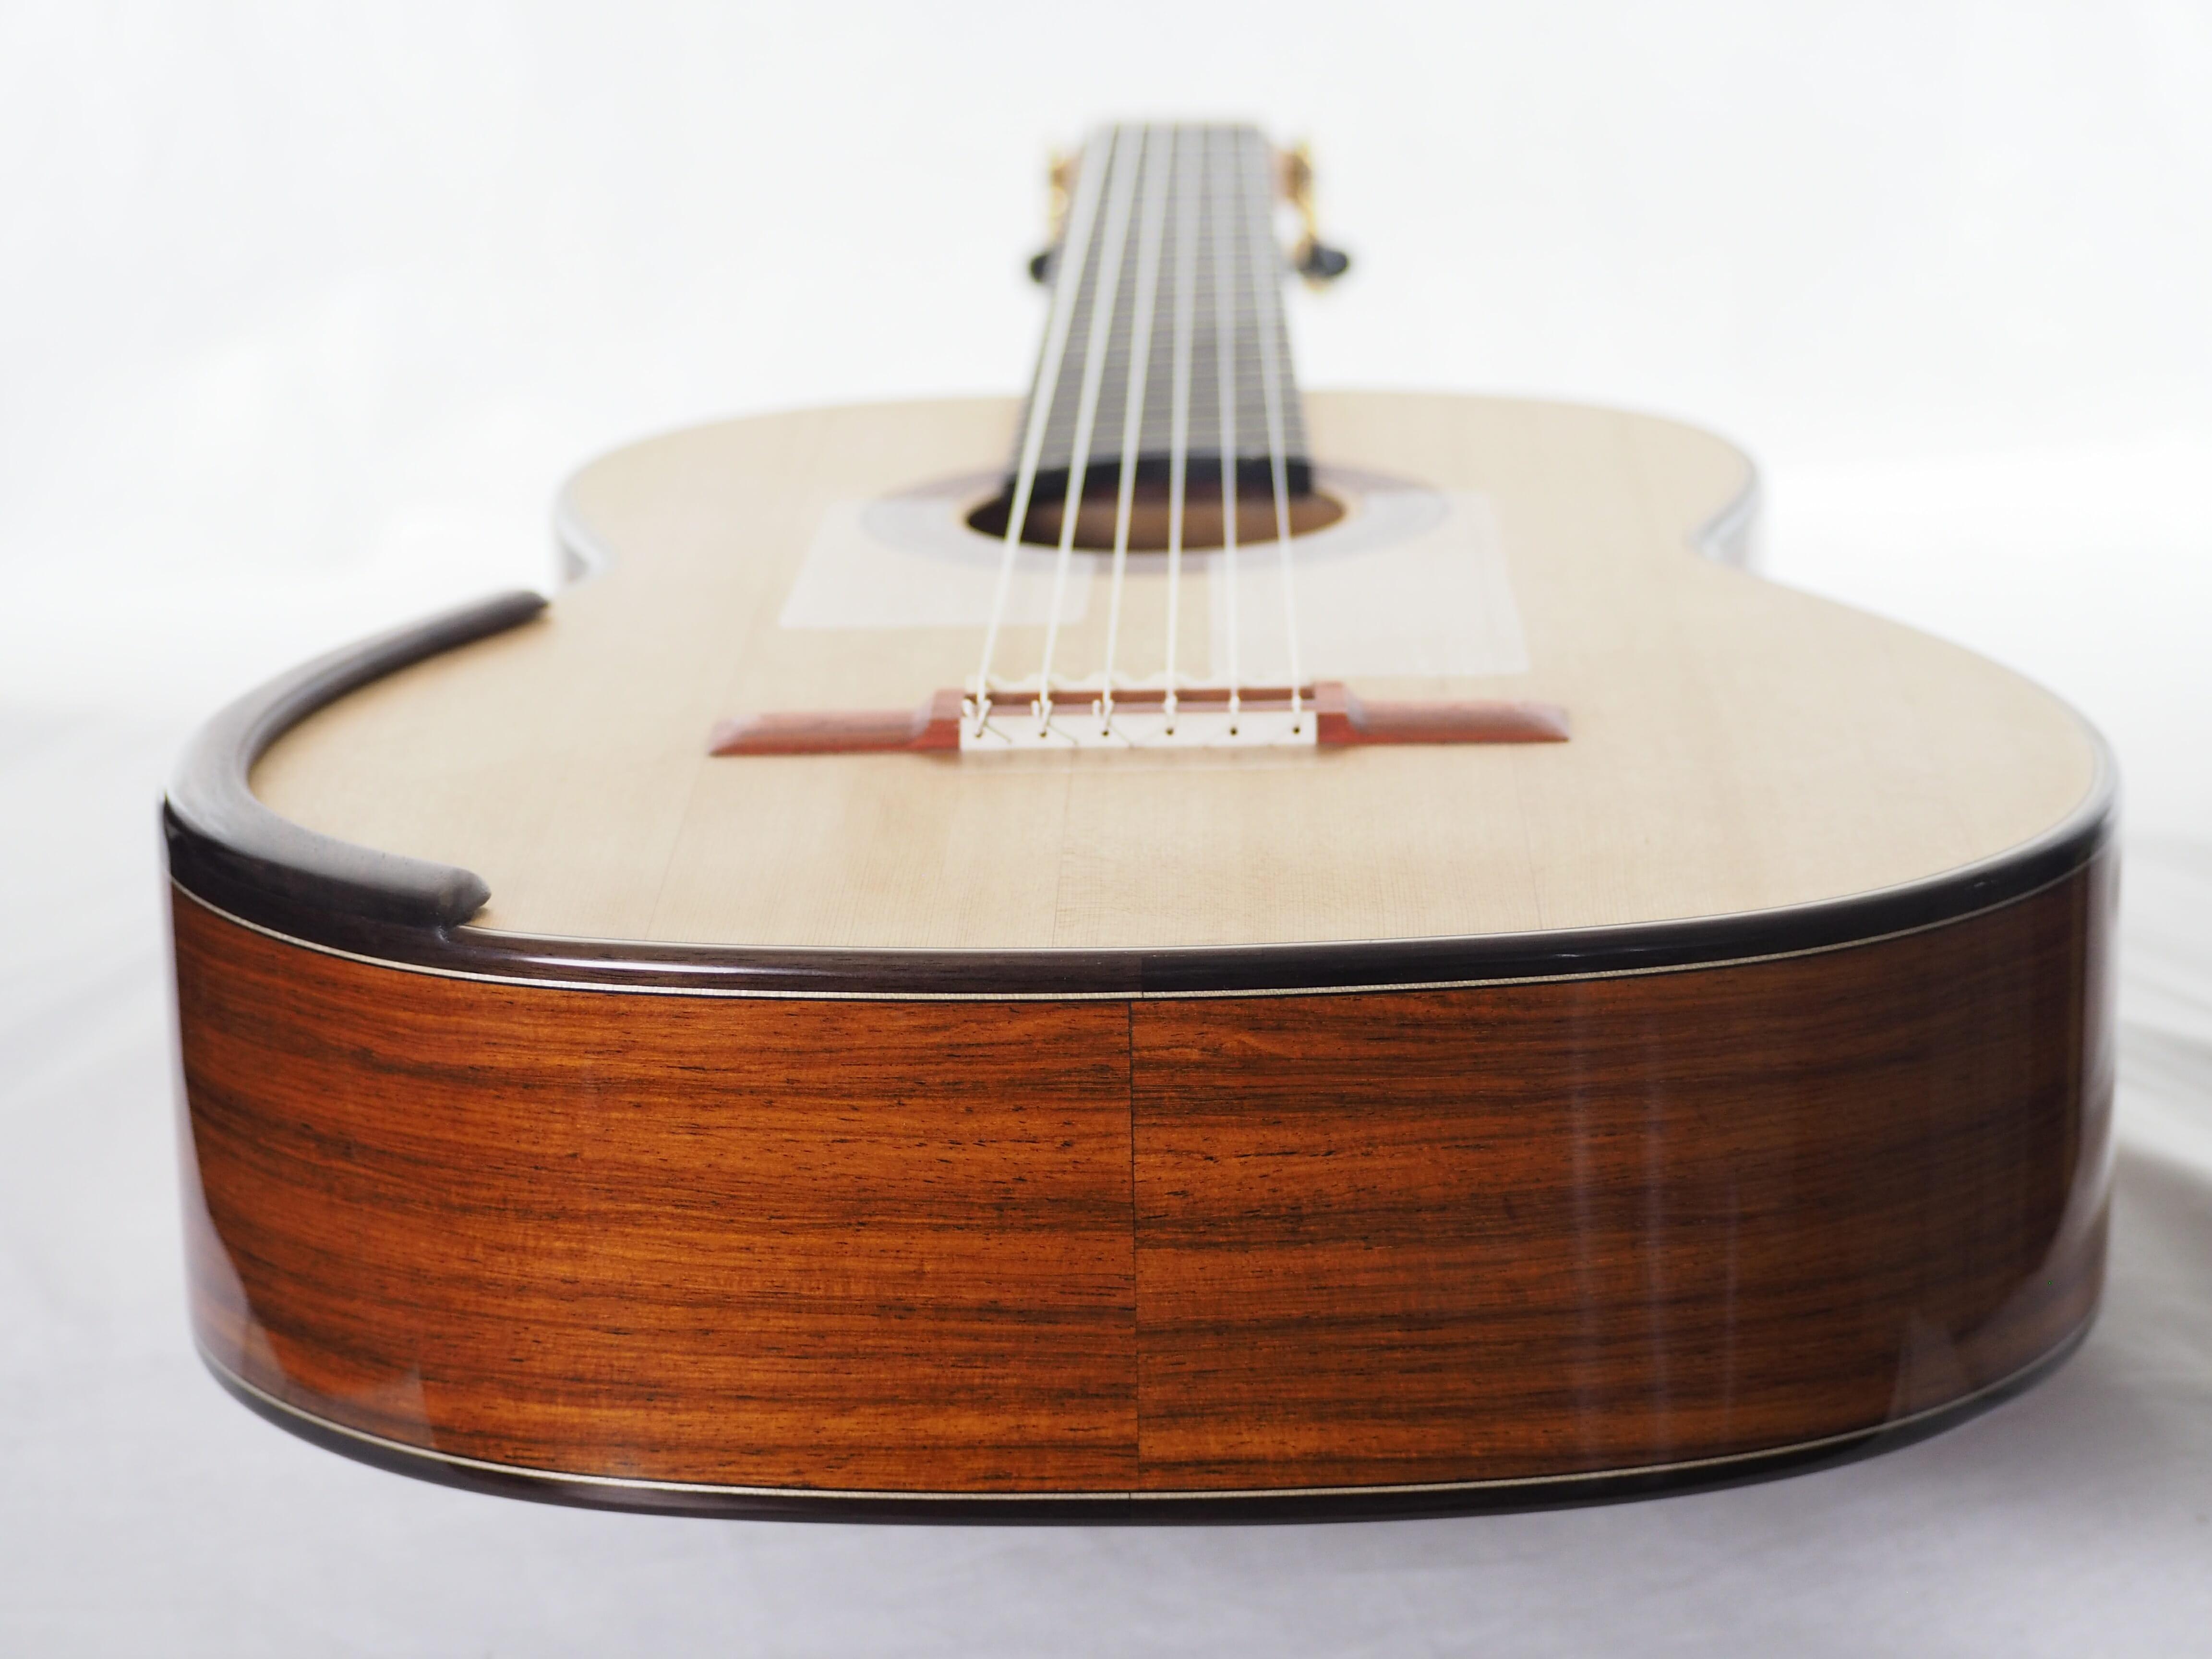 Greg Smallman & sons 2016 guitare classique de luthier barrage lattice